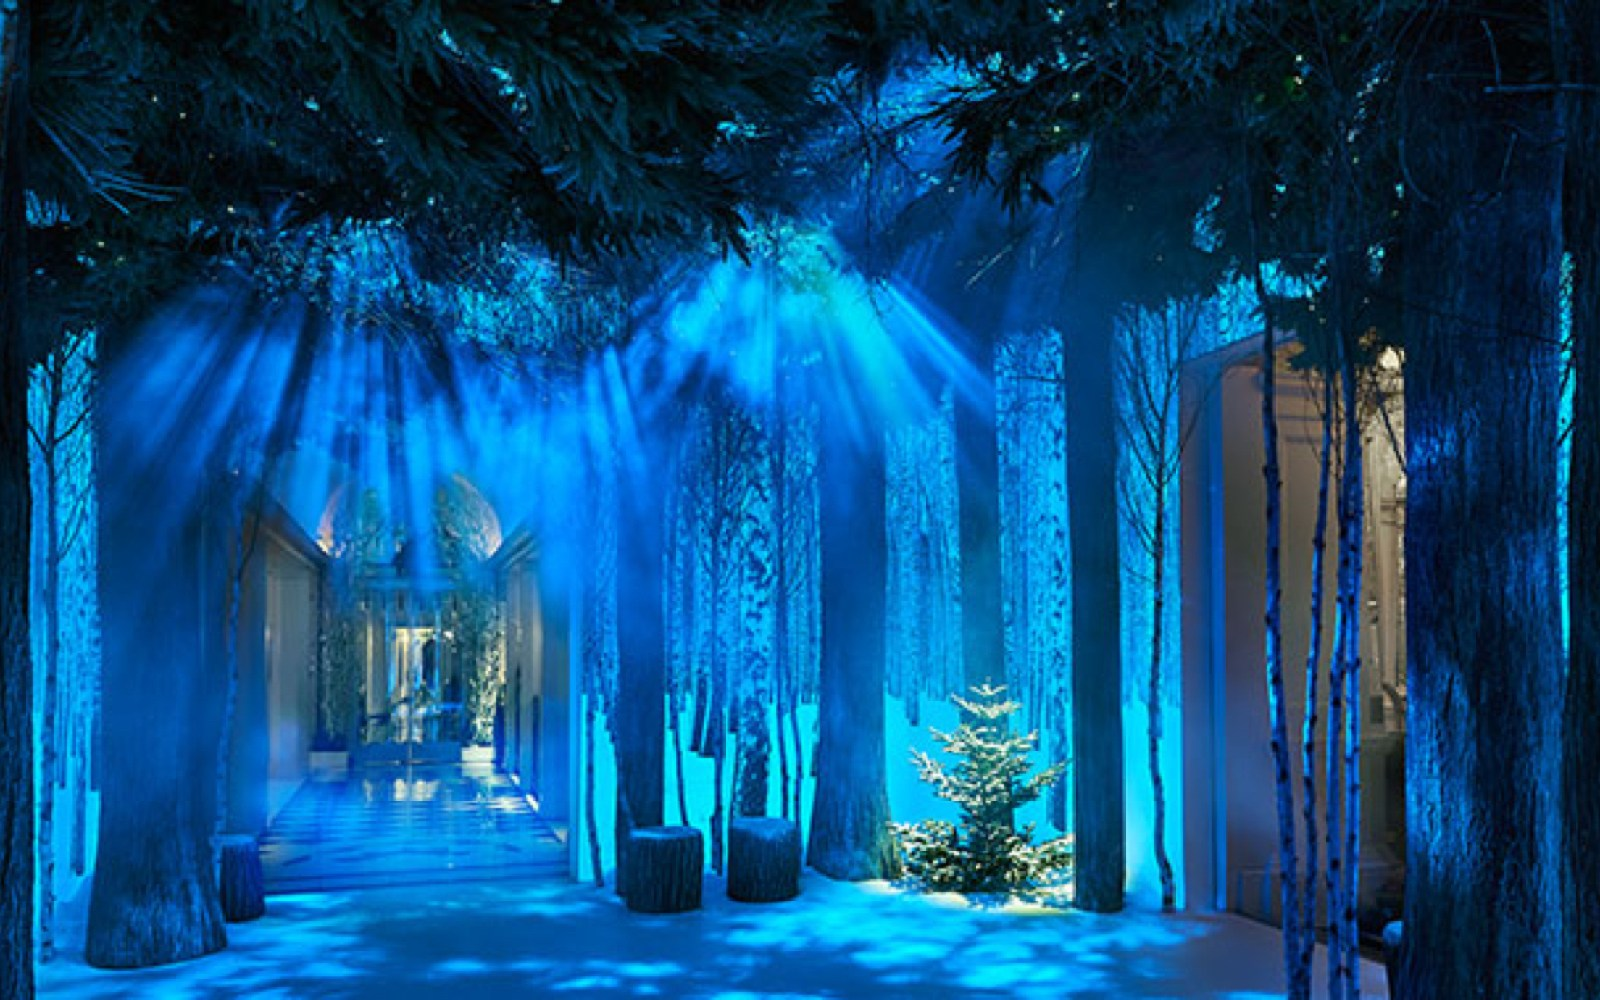 Claridges hotel unveils Christmas tree festive installation designed by Jony Ive and Marc Newson